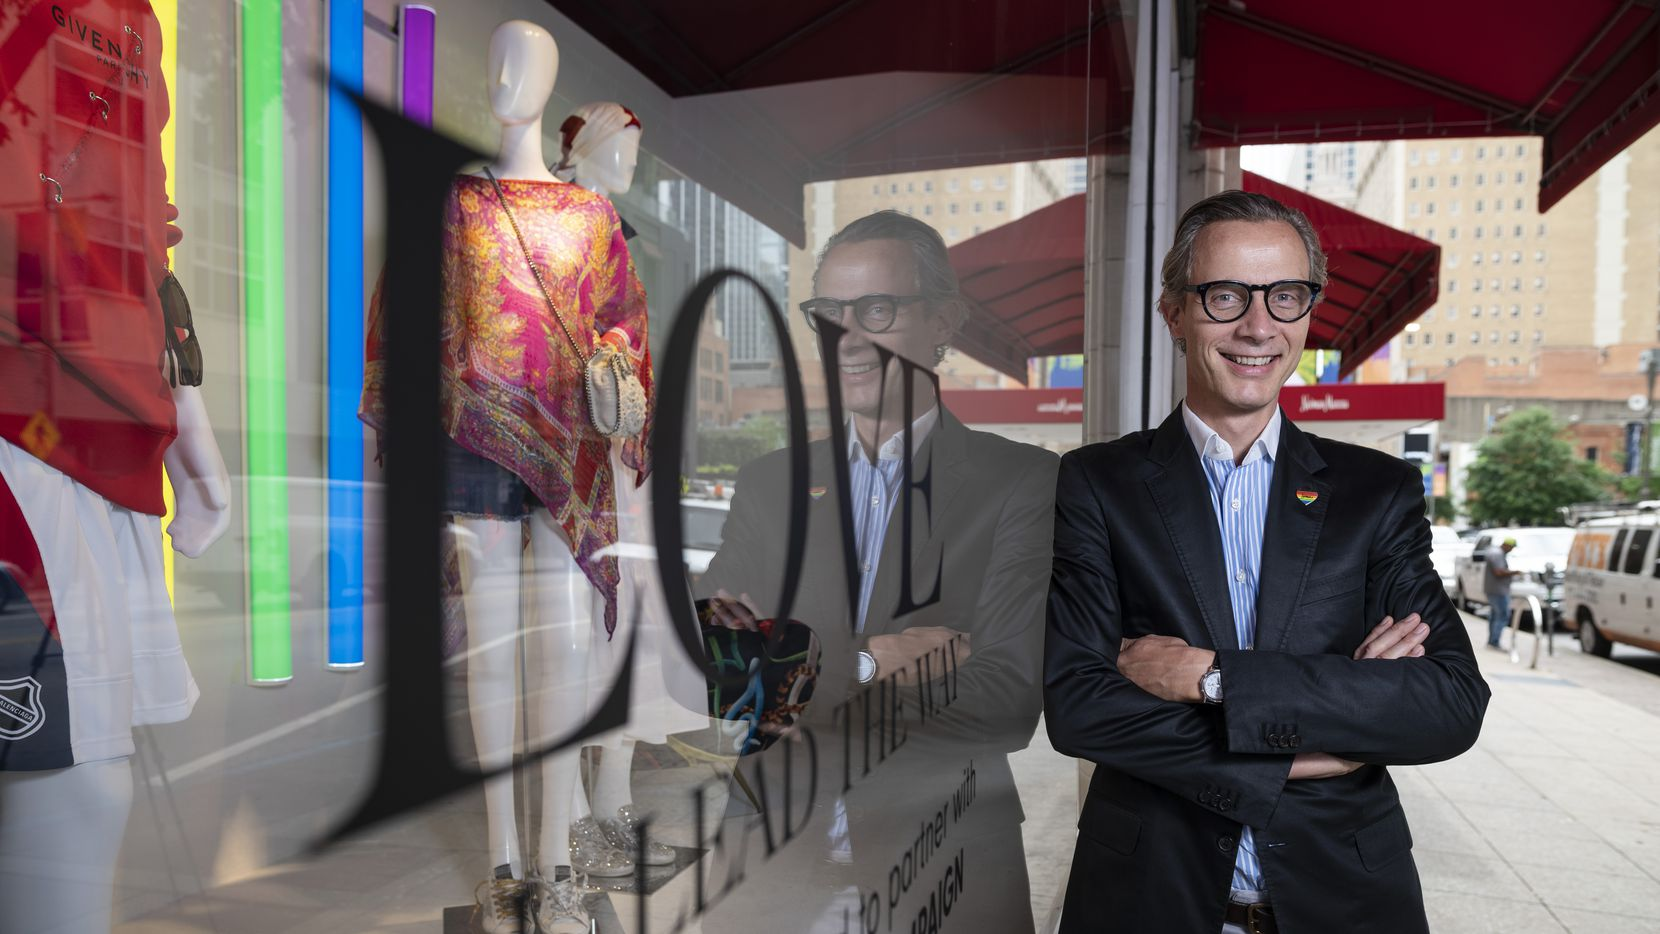 Geoffroy van Raemdonck, chief executive officer of Neiman Marcus Group.